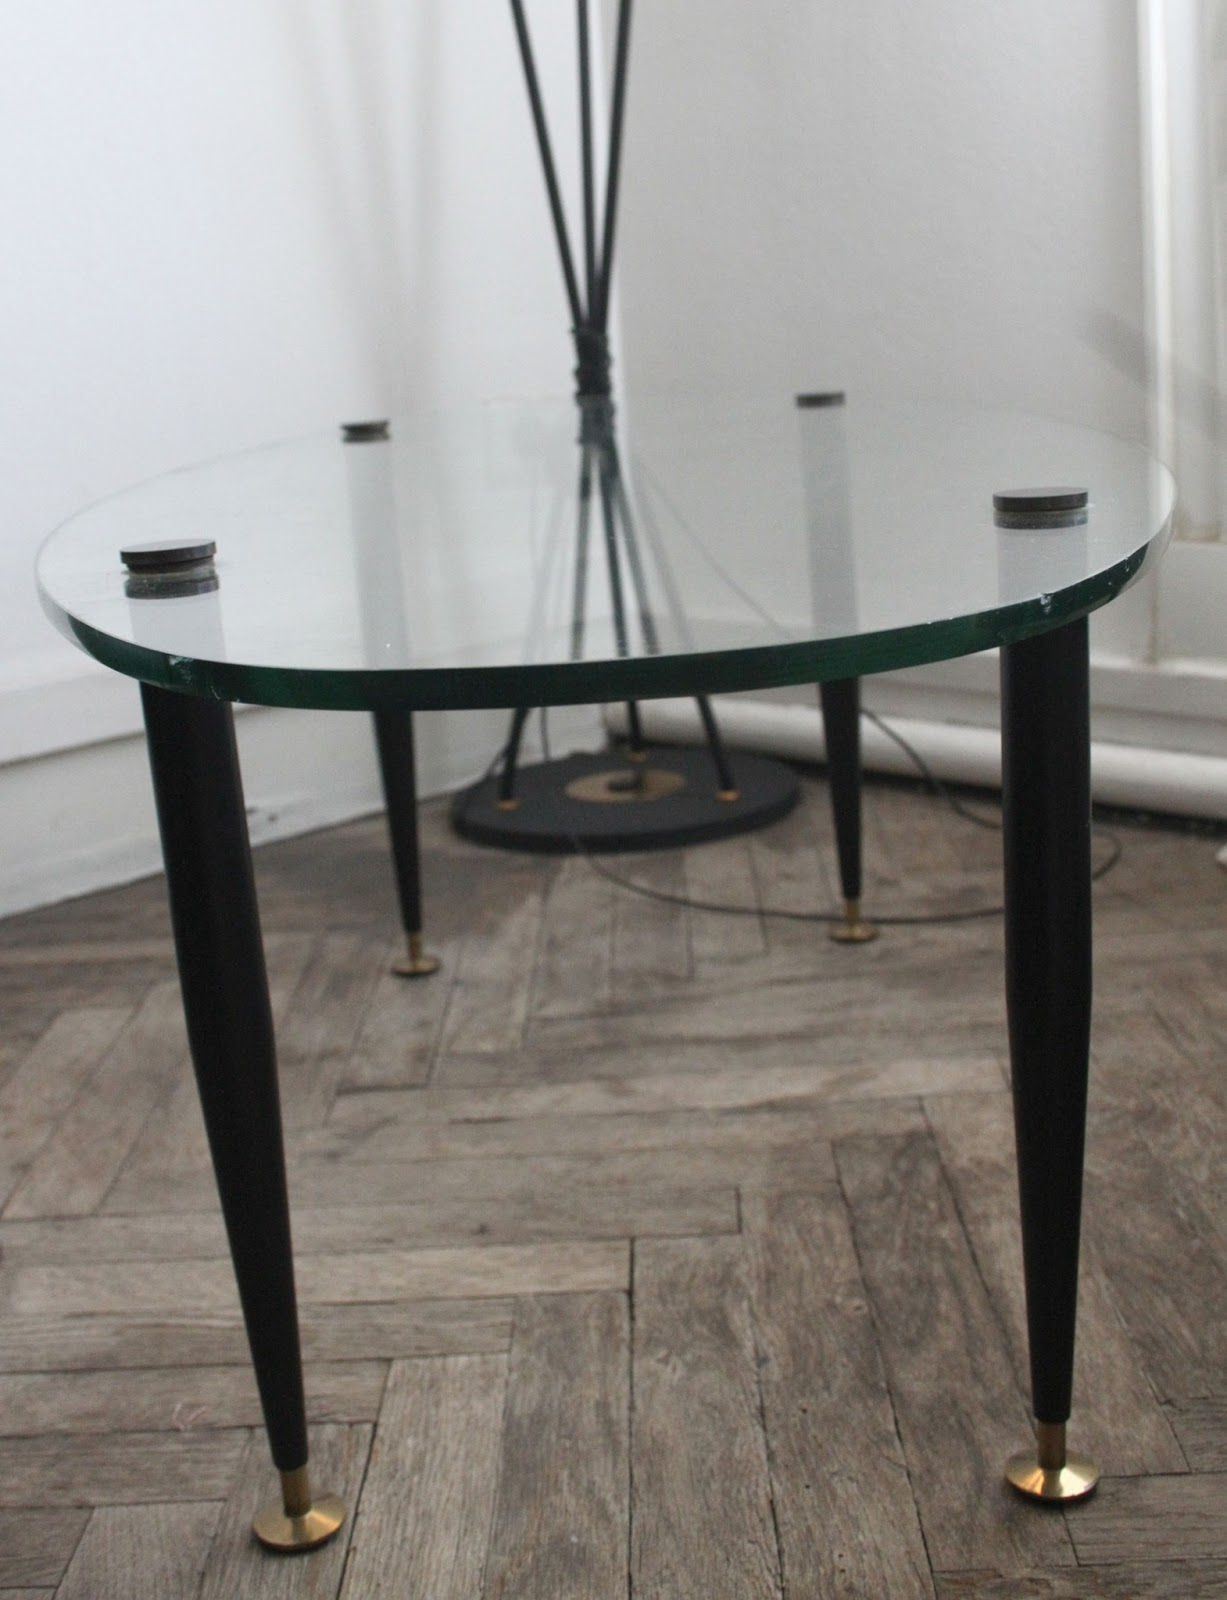 Chicbaazar objets vintage 50 60 70 petite table basse verre 1950 pieds fusel s - Petite table basse en verre ...